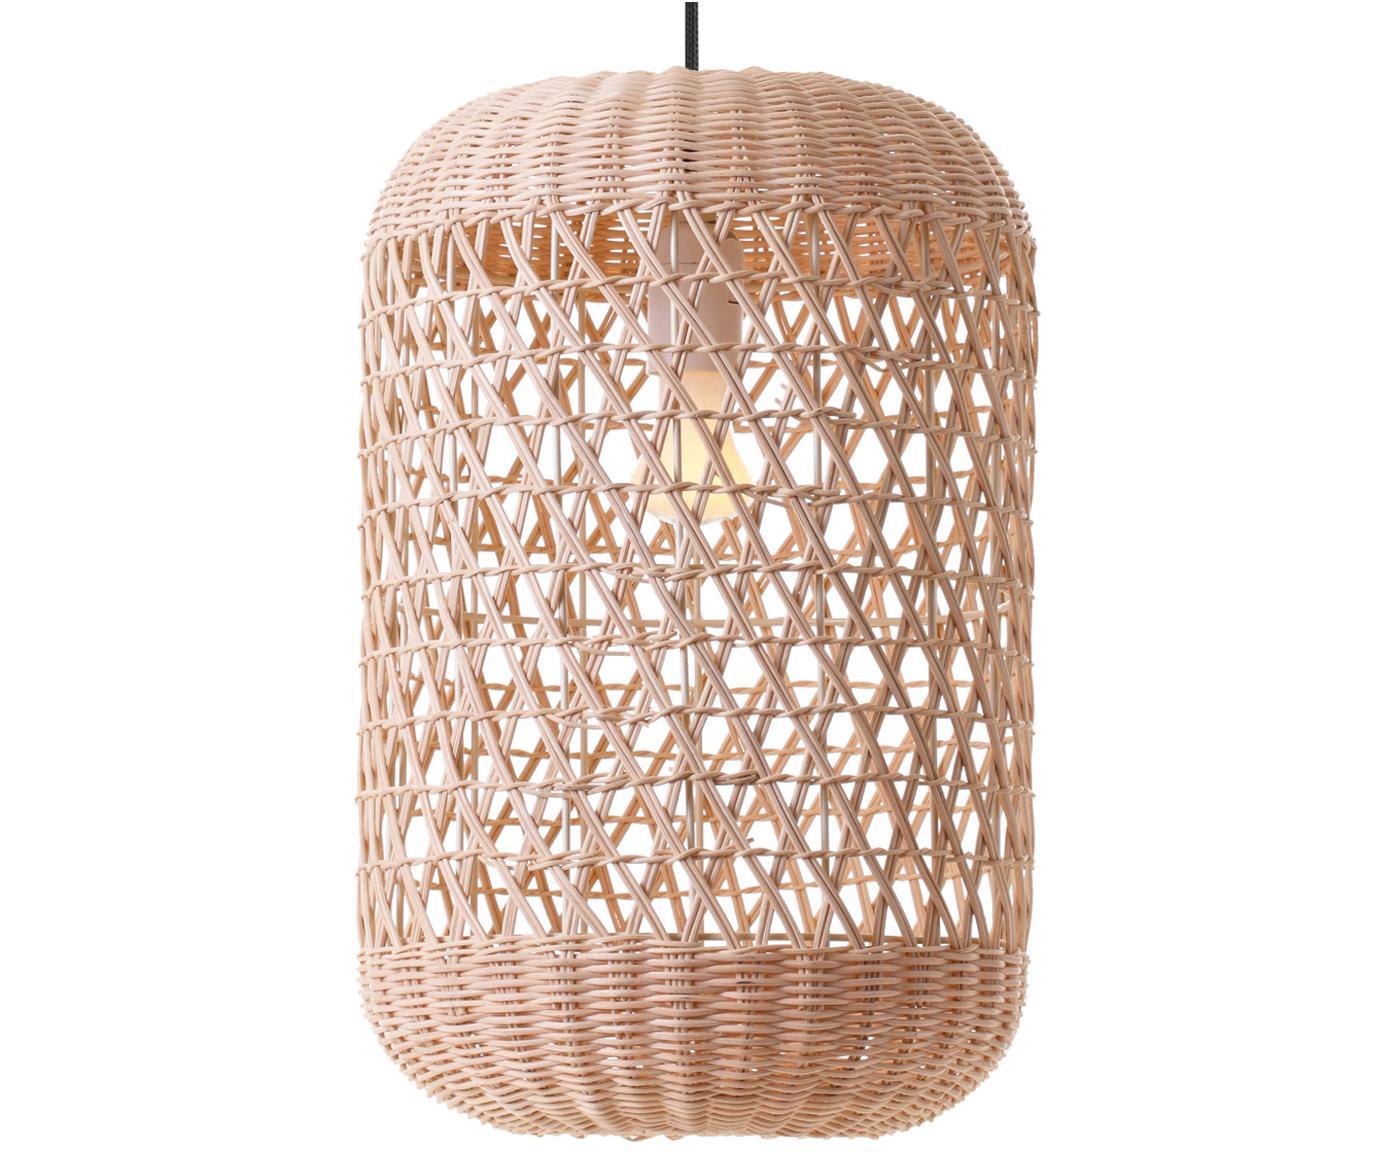 Hanglamp Aurora, Lampenkap: bamboehout, Baldakijn: kunststof, Lichtbruin, Ø 25 x H 37 cm